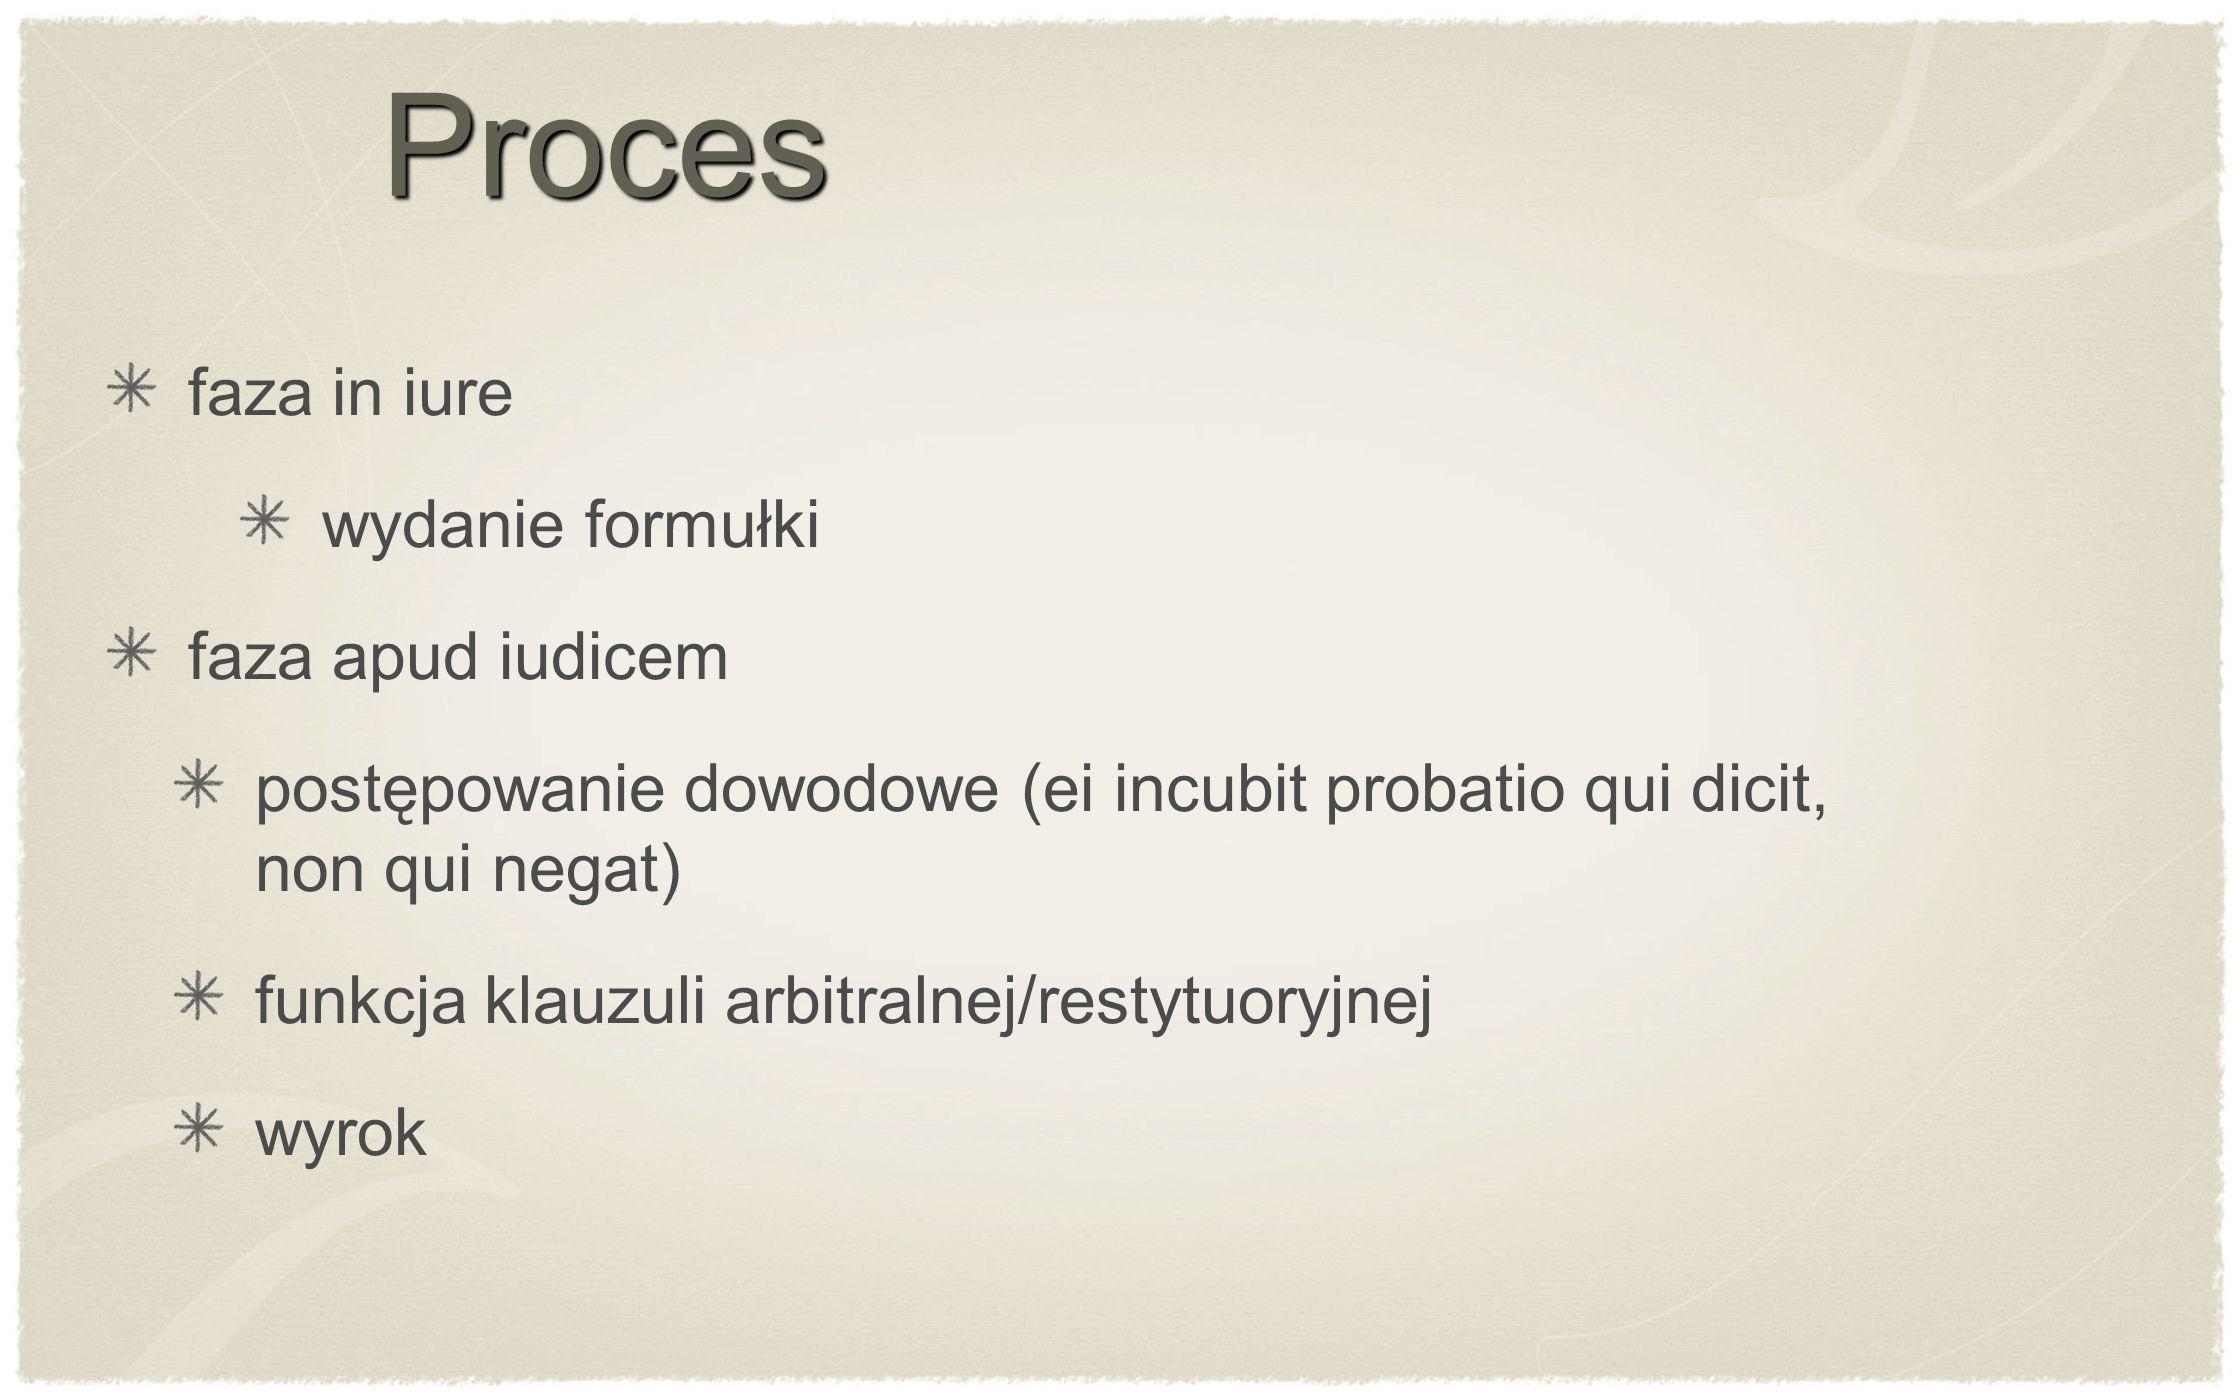 Proces faza in iure wydanie formułki faza apud iudicem postępowanie dowodowe (ei incubit probatio qui dicit, non qui negat) funkcja klauzuli arbitraln